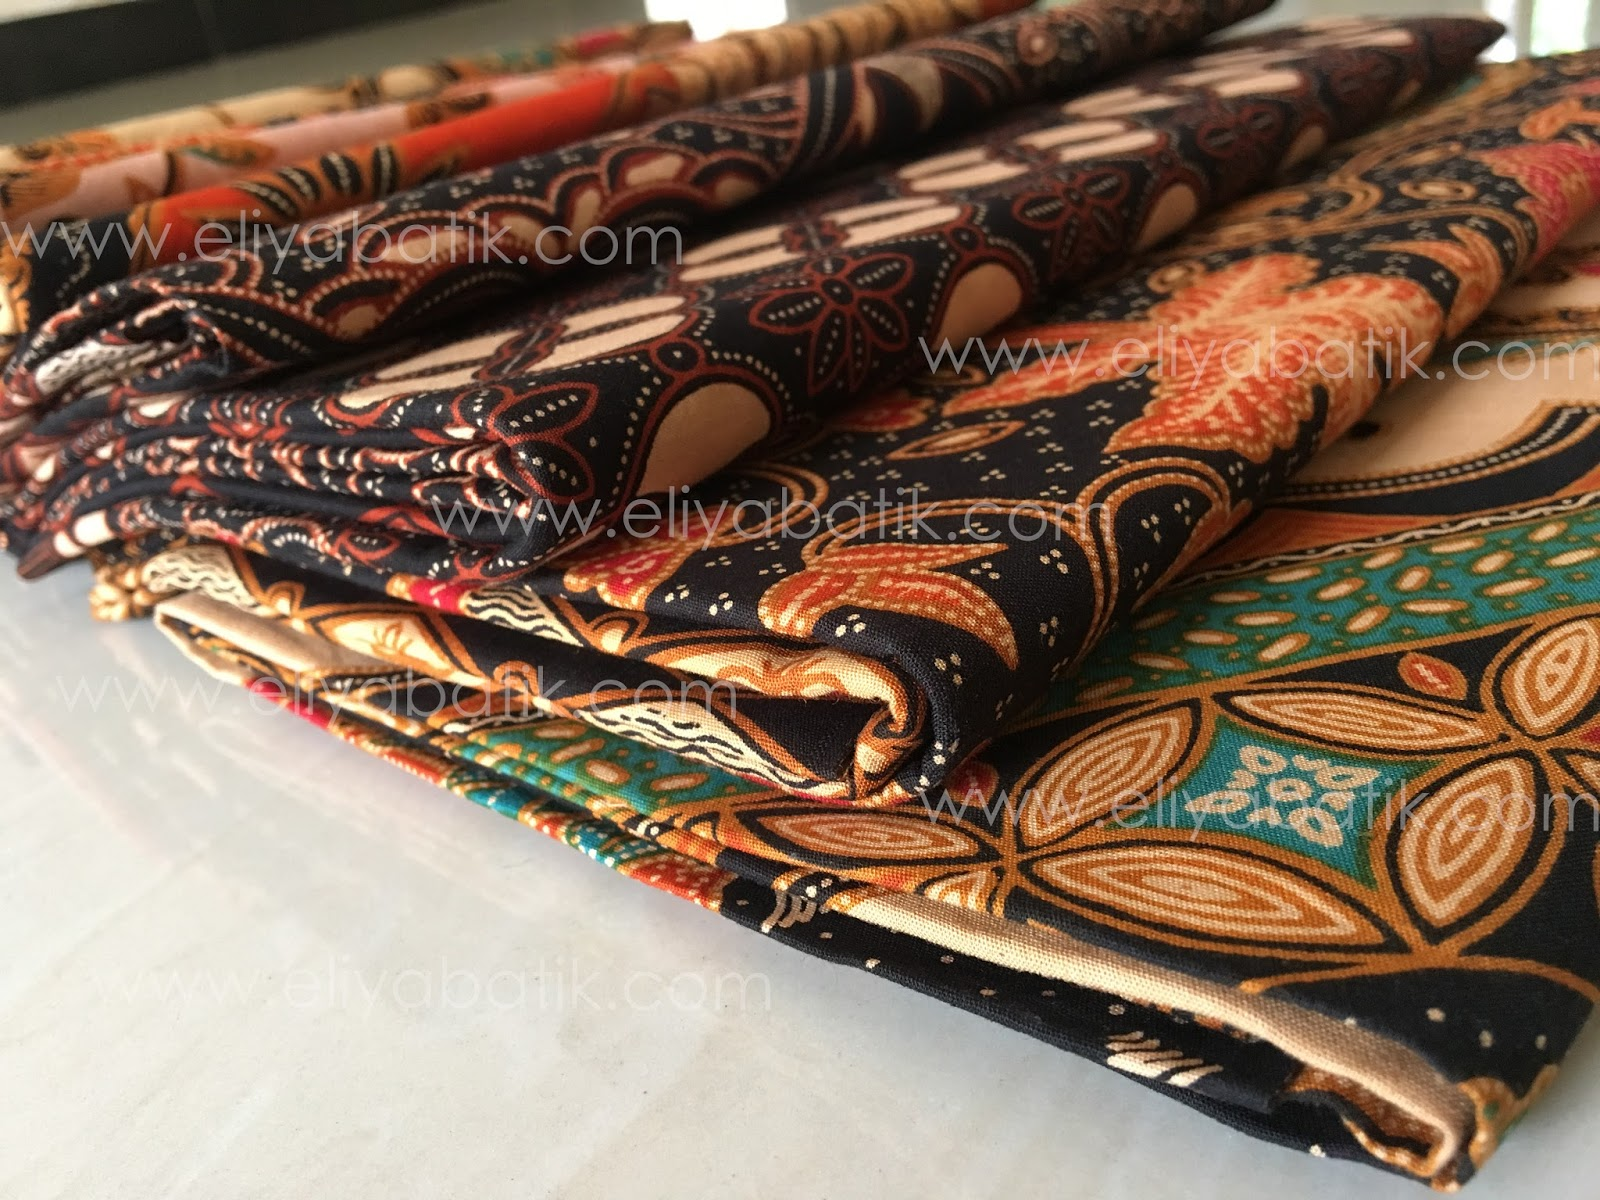 Eliya Batik grosir kain batik printing murah bandung